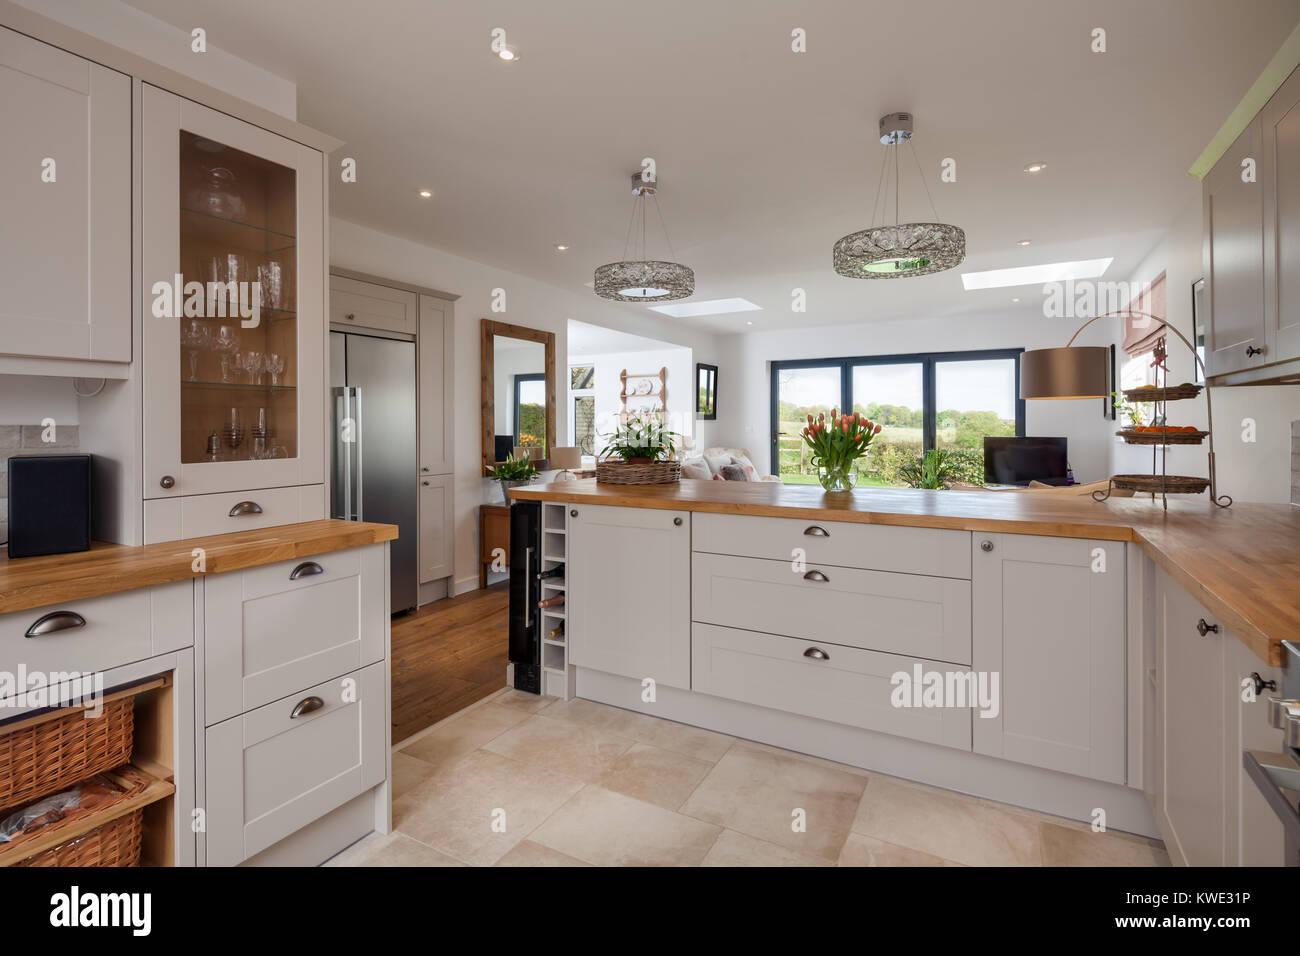 Cupboards Refrigerator In Kitchen Stockfotos & Cupboards ...